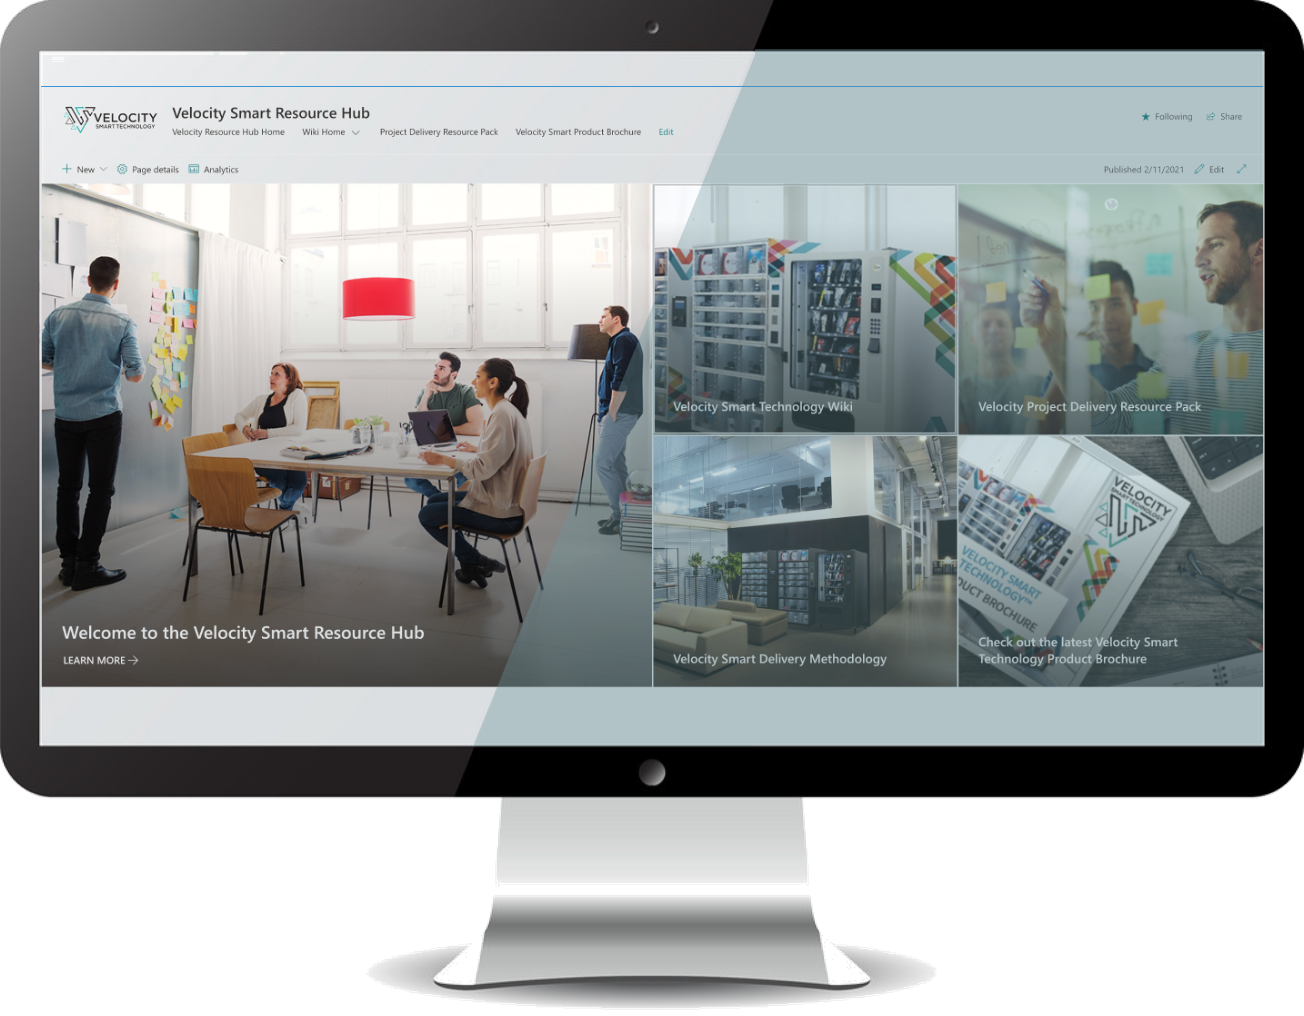 Velocity Smart Resource Hub